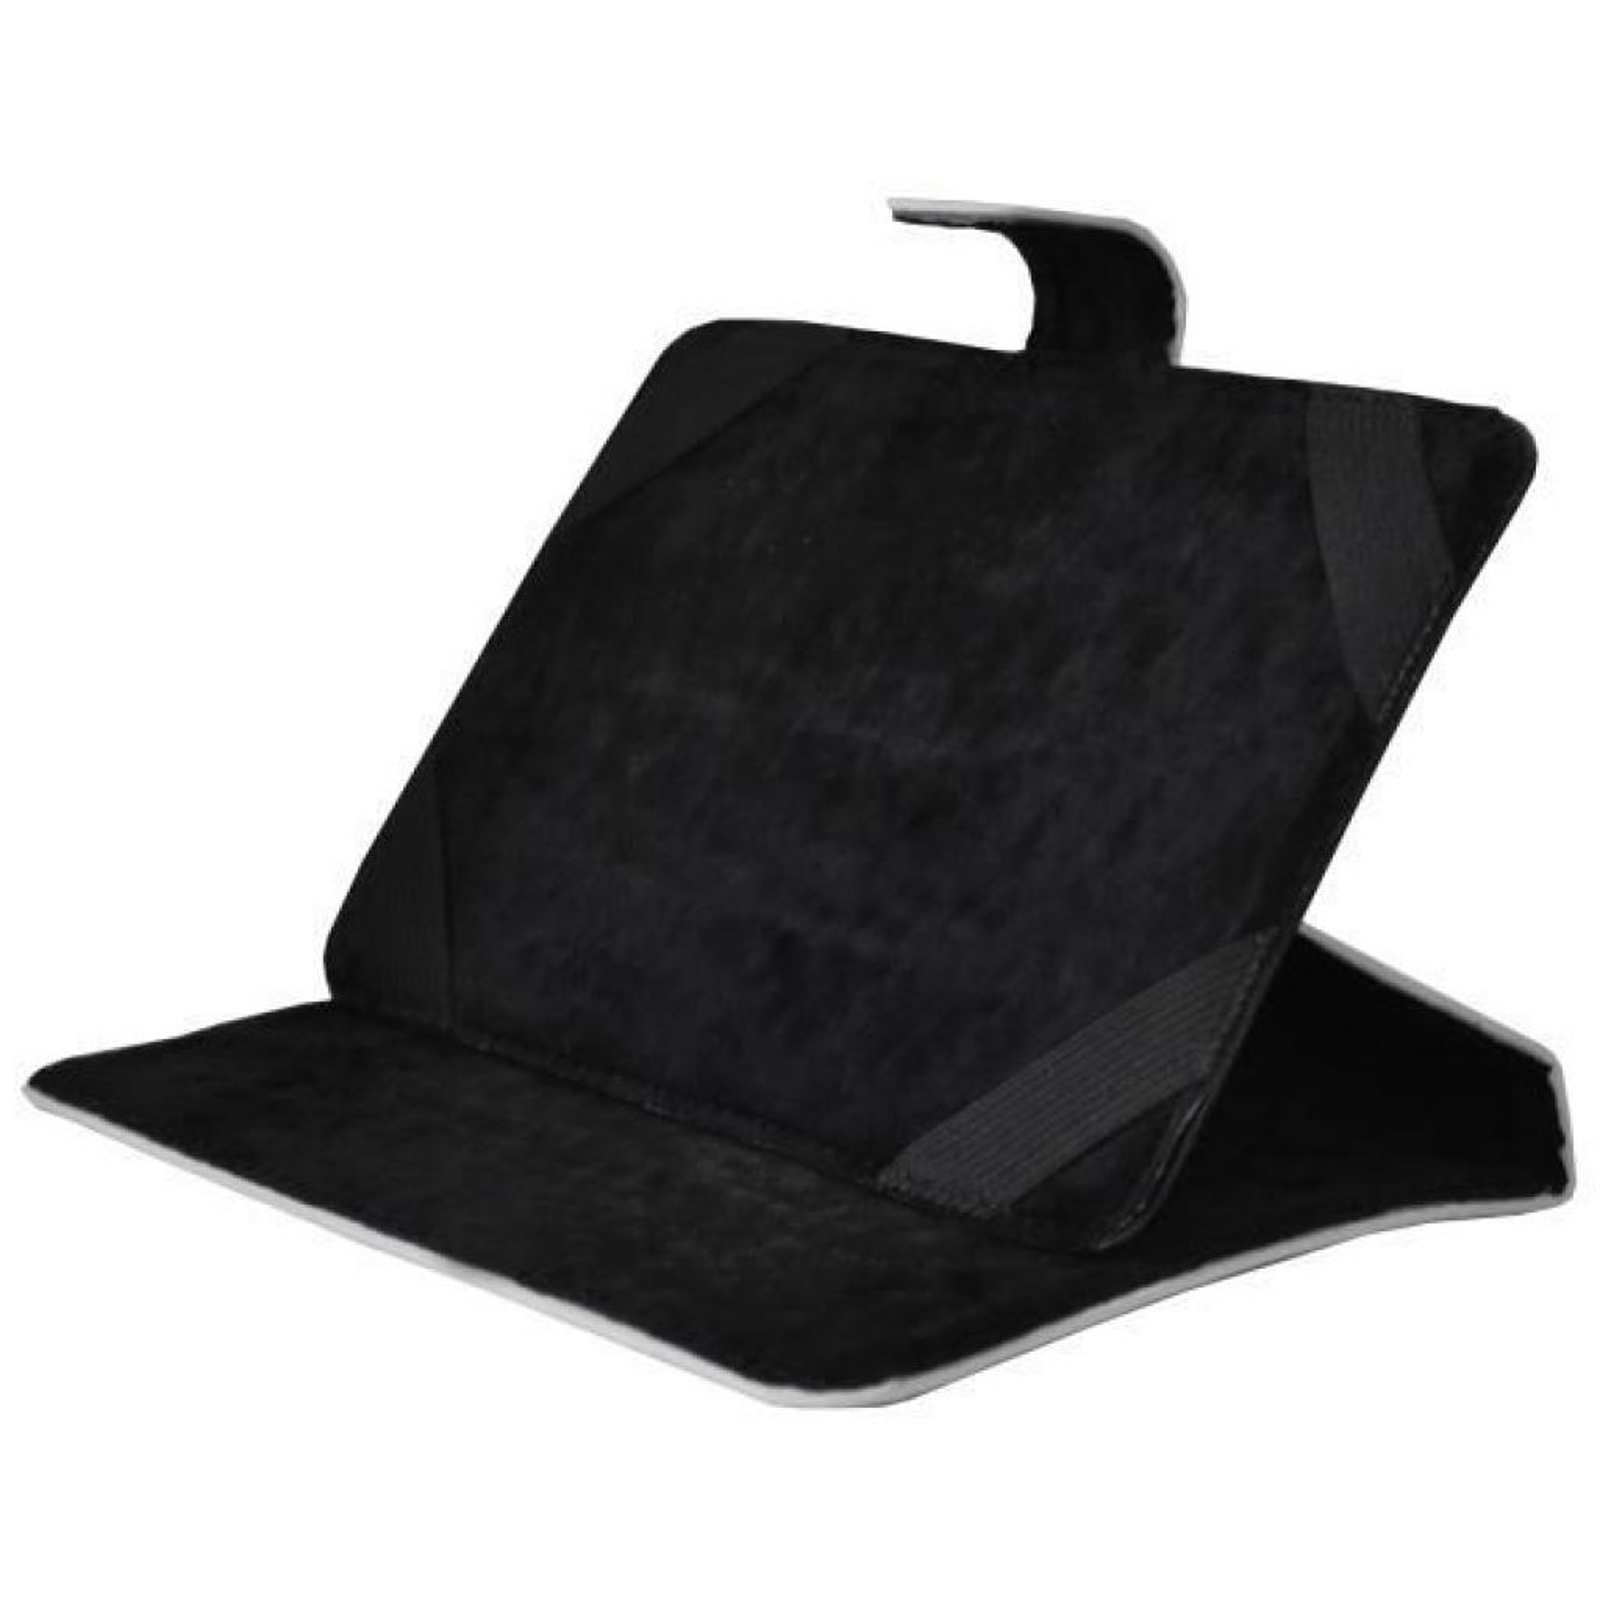 Чехол для планшета Vento 8 Advanced - white изображение 2